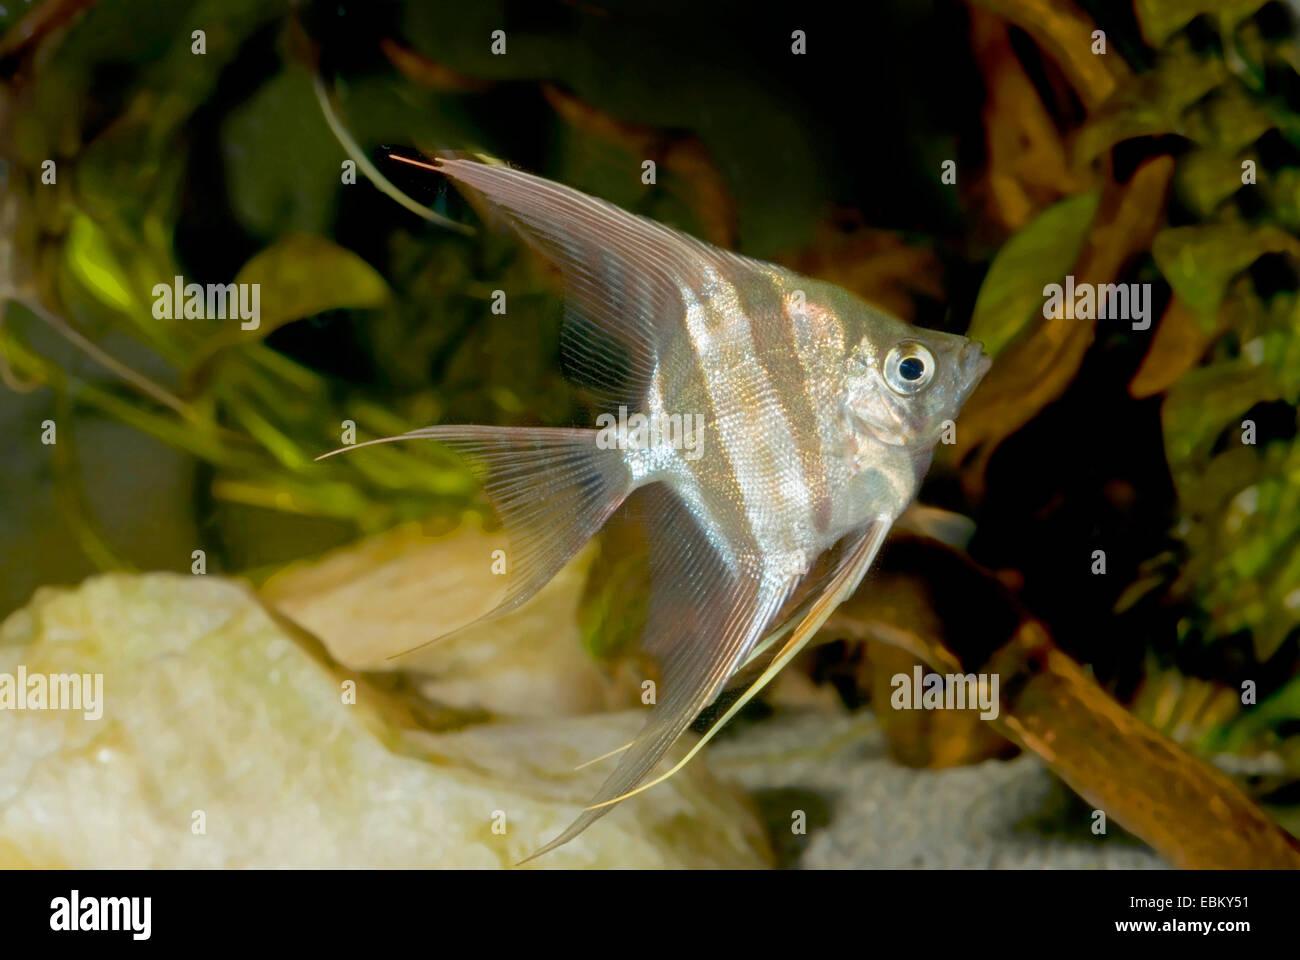 Profunda peces ángel, Real; largas aletas Altum-Angel Ángel (Pterophyllum altum), forma silvestre Imagen De Stock